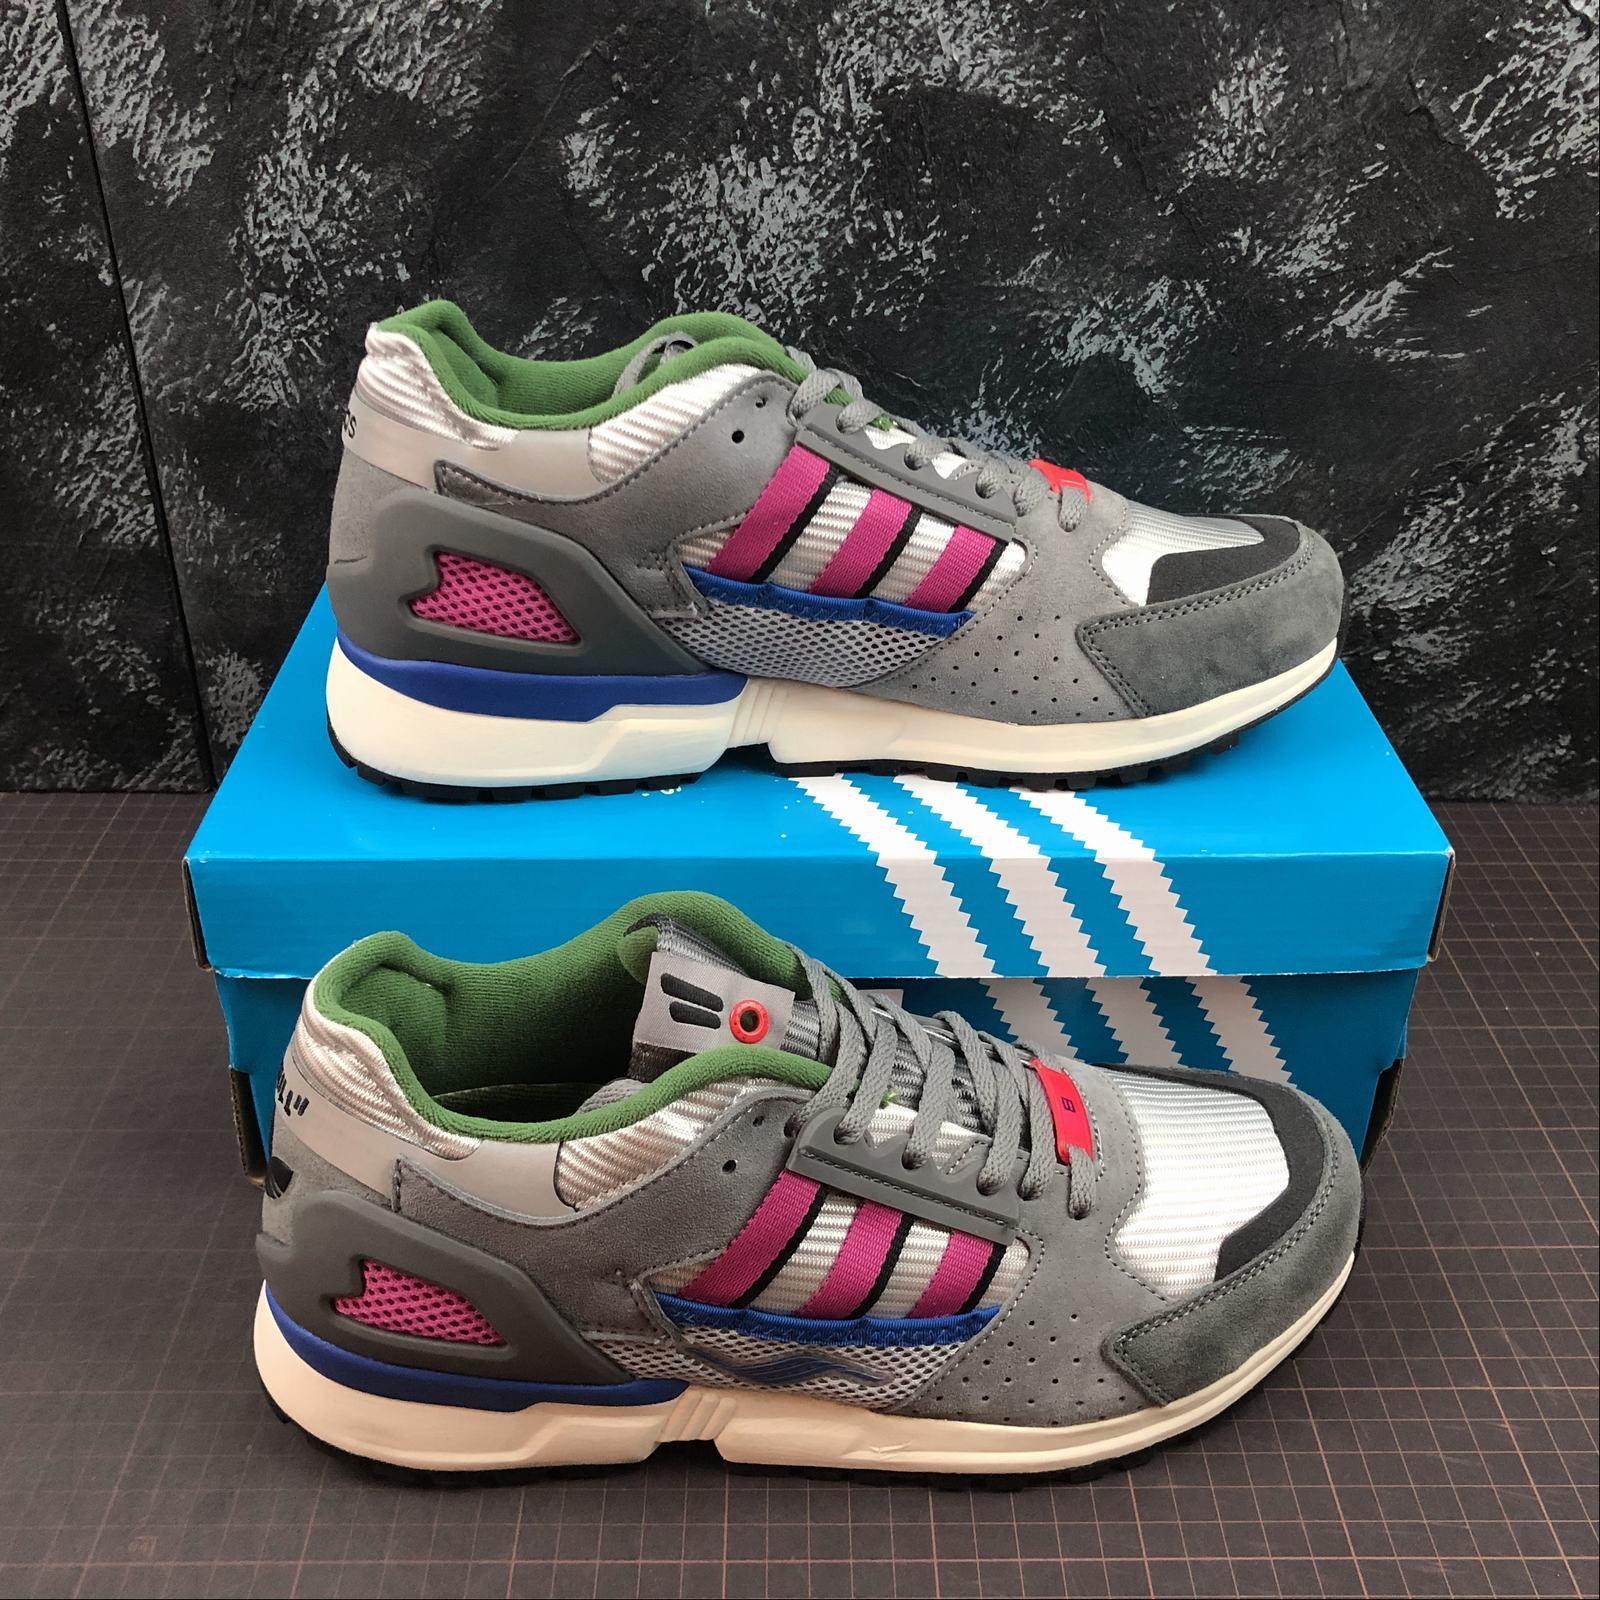 giay-sneaker-adidas-zx10000-c-overkill-g26252